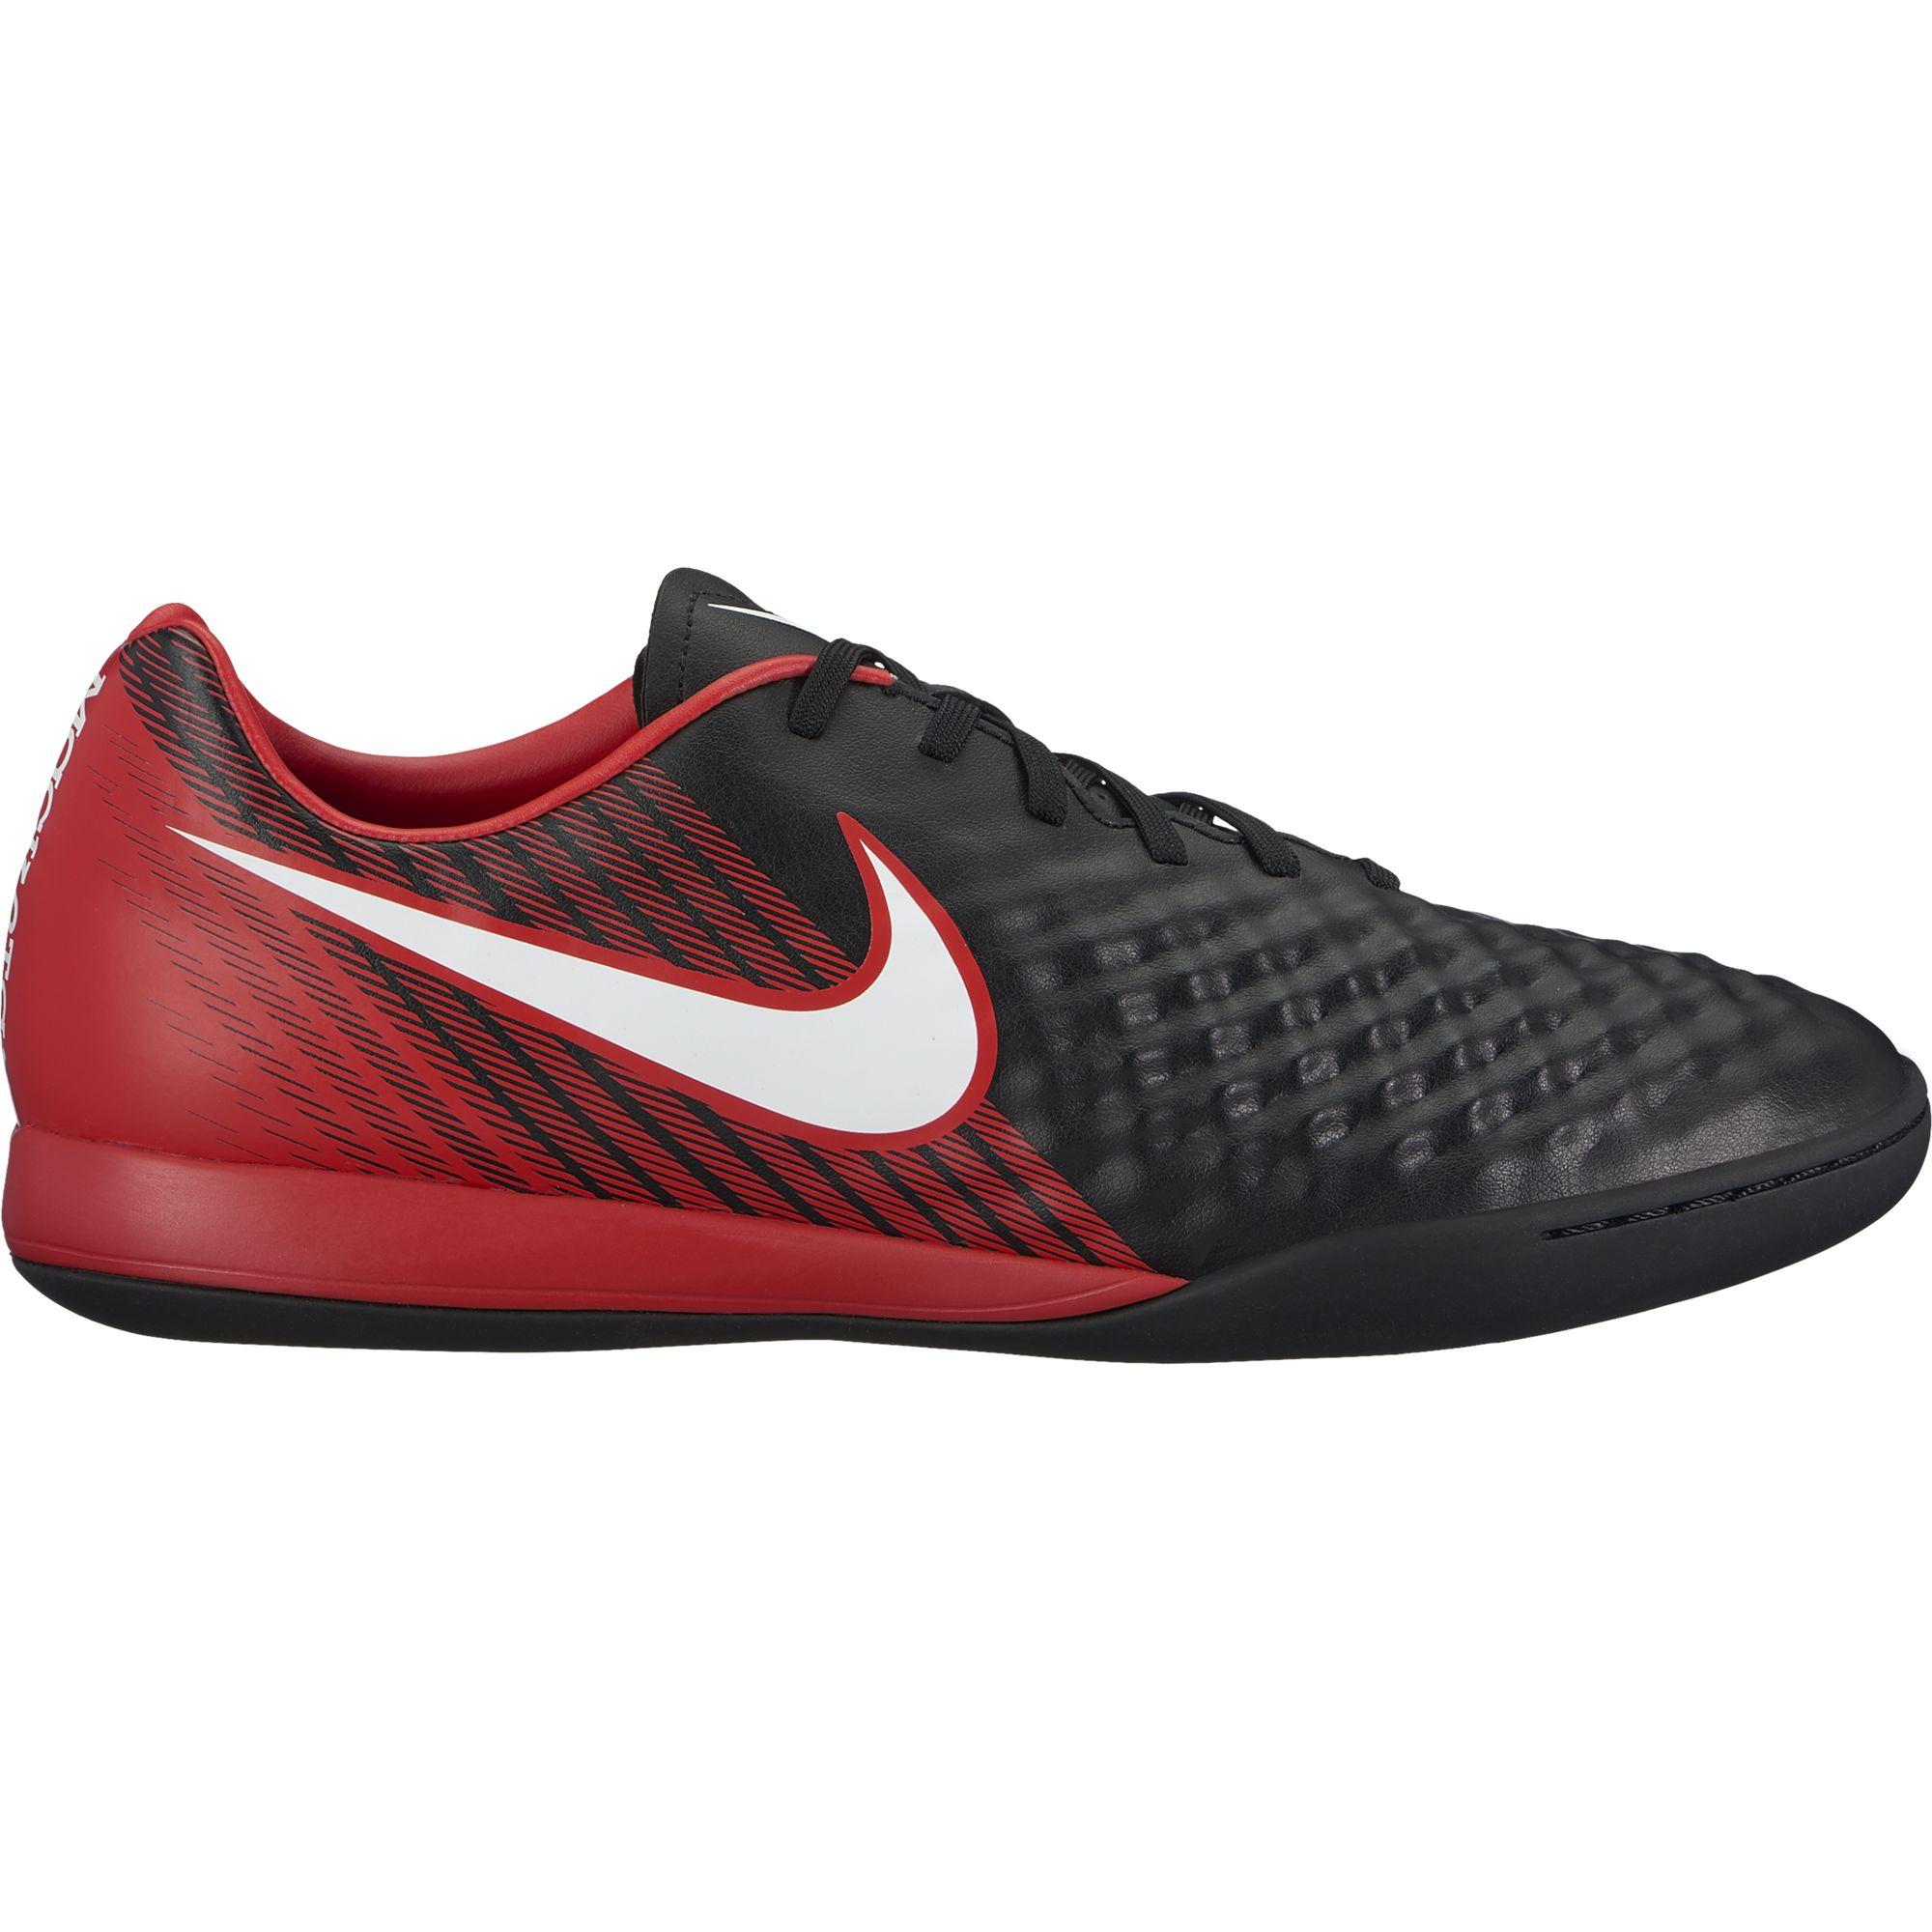 Nike MagistaX Onda II (IC) voetbalschoen